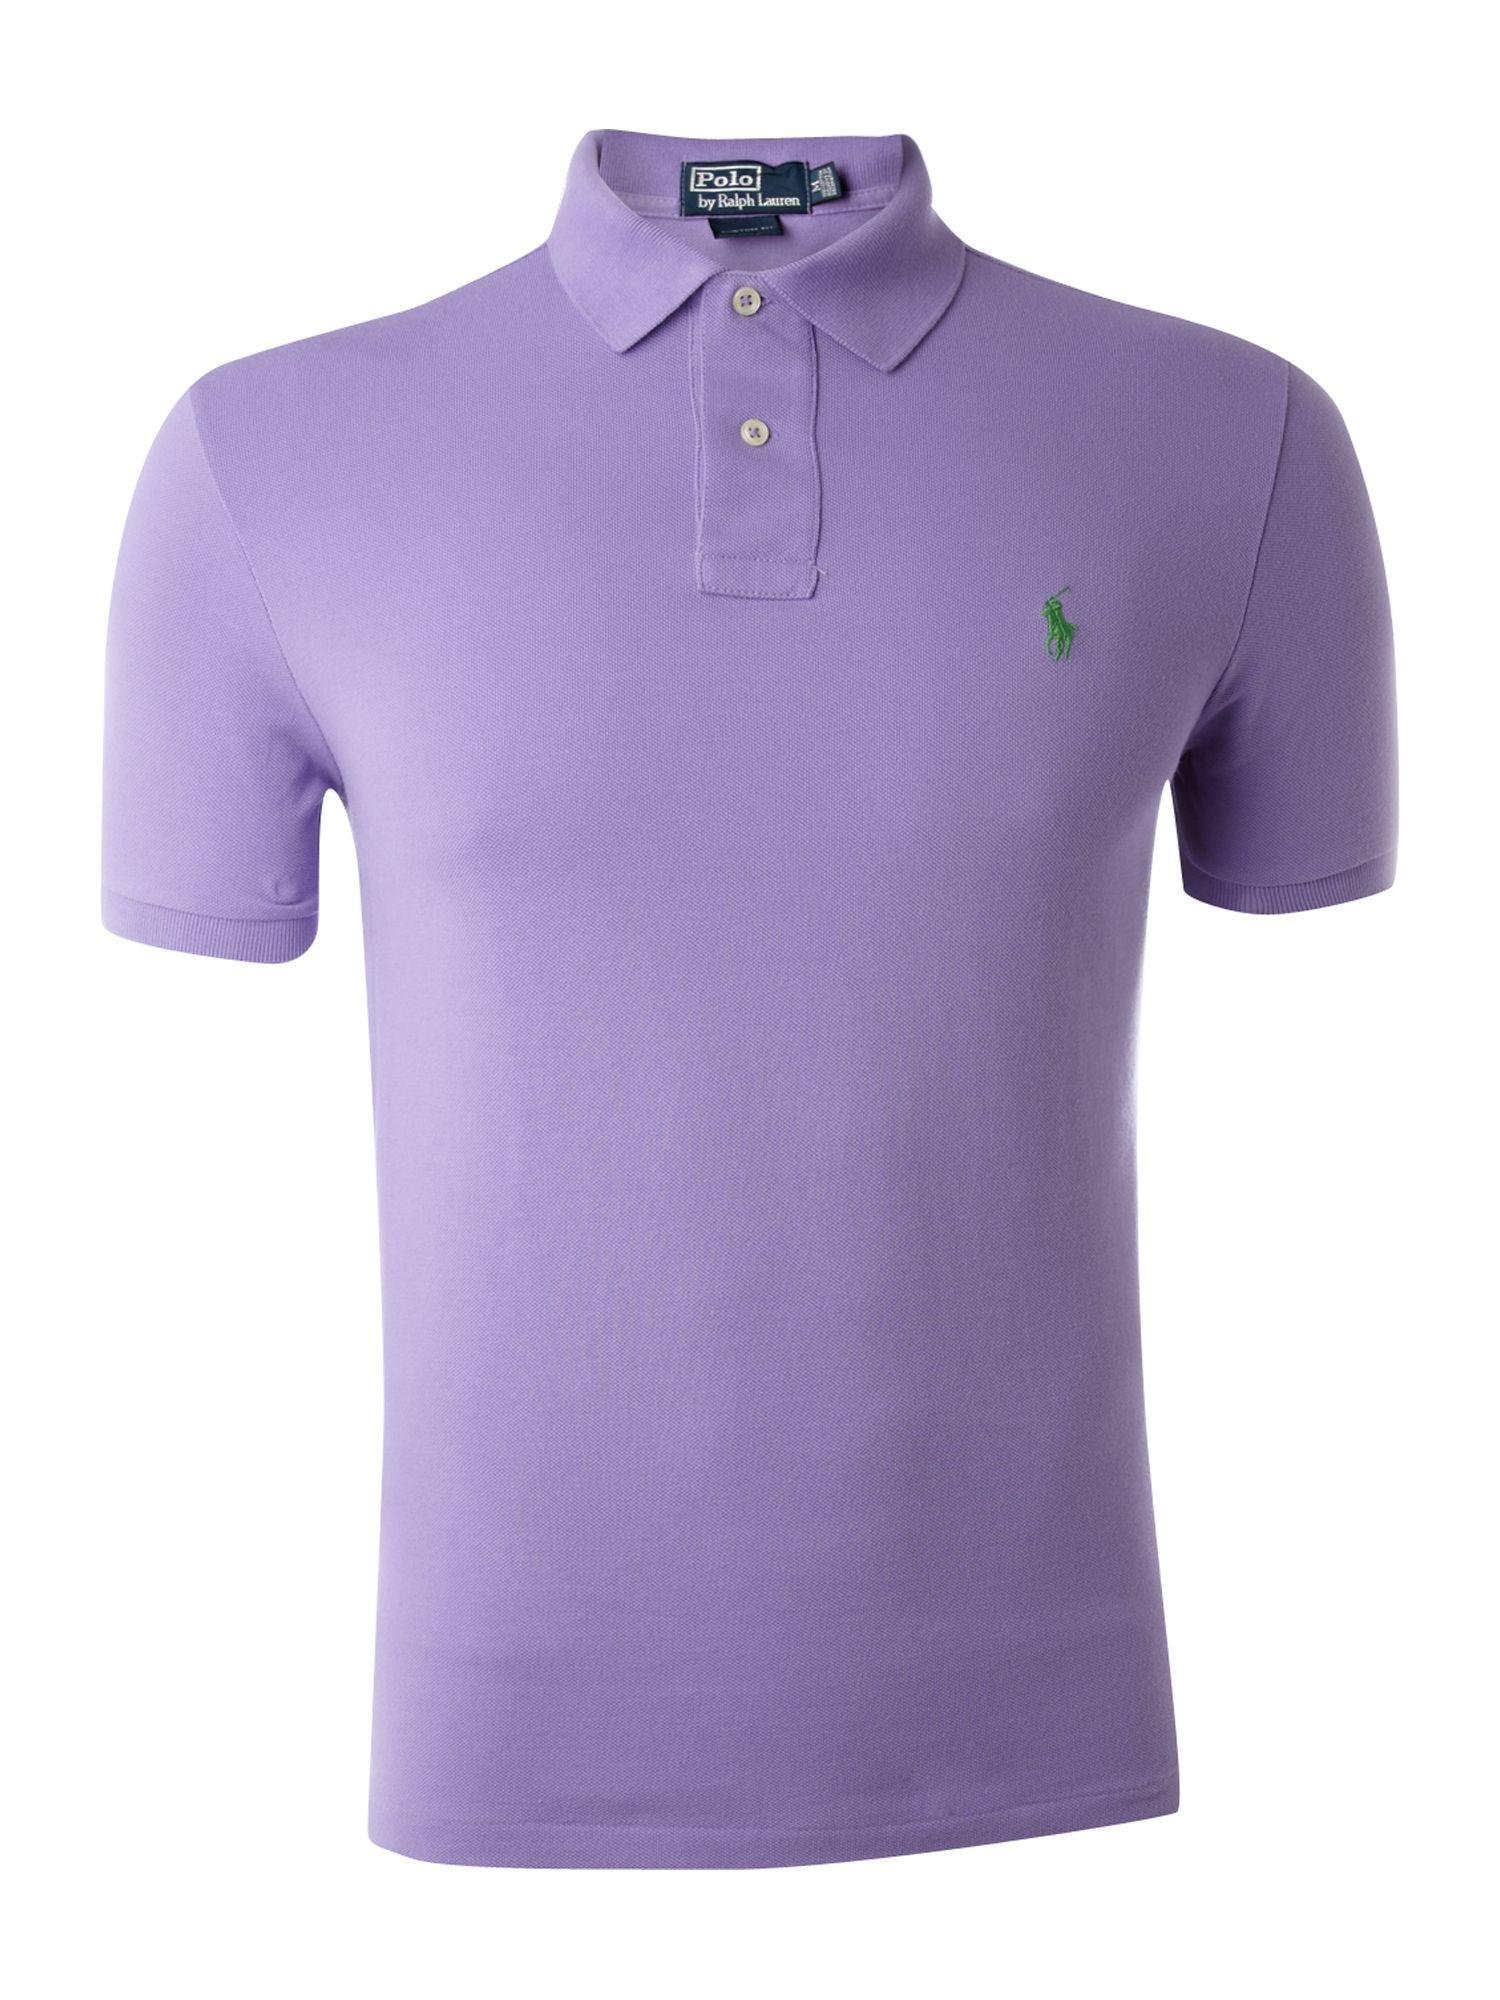 Polo ralph lauren custom fit mesh polo shirt in purple for for Polo ralph lauren custom fit polo shirt